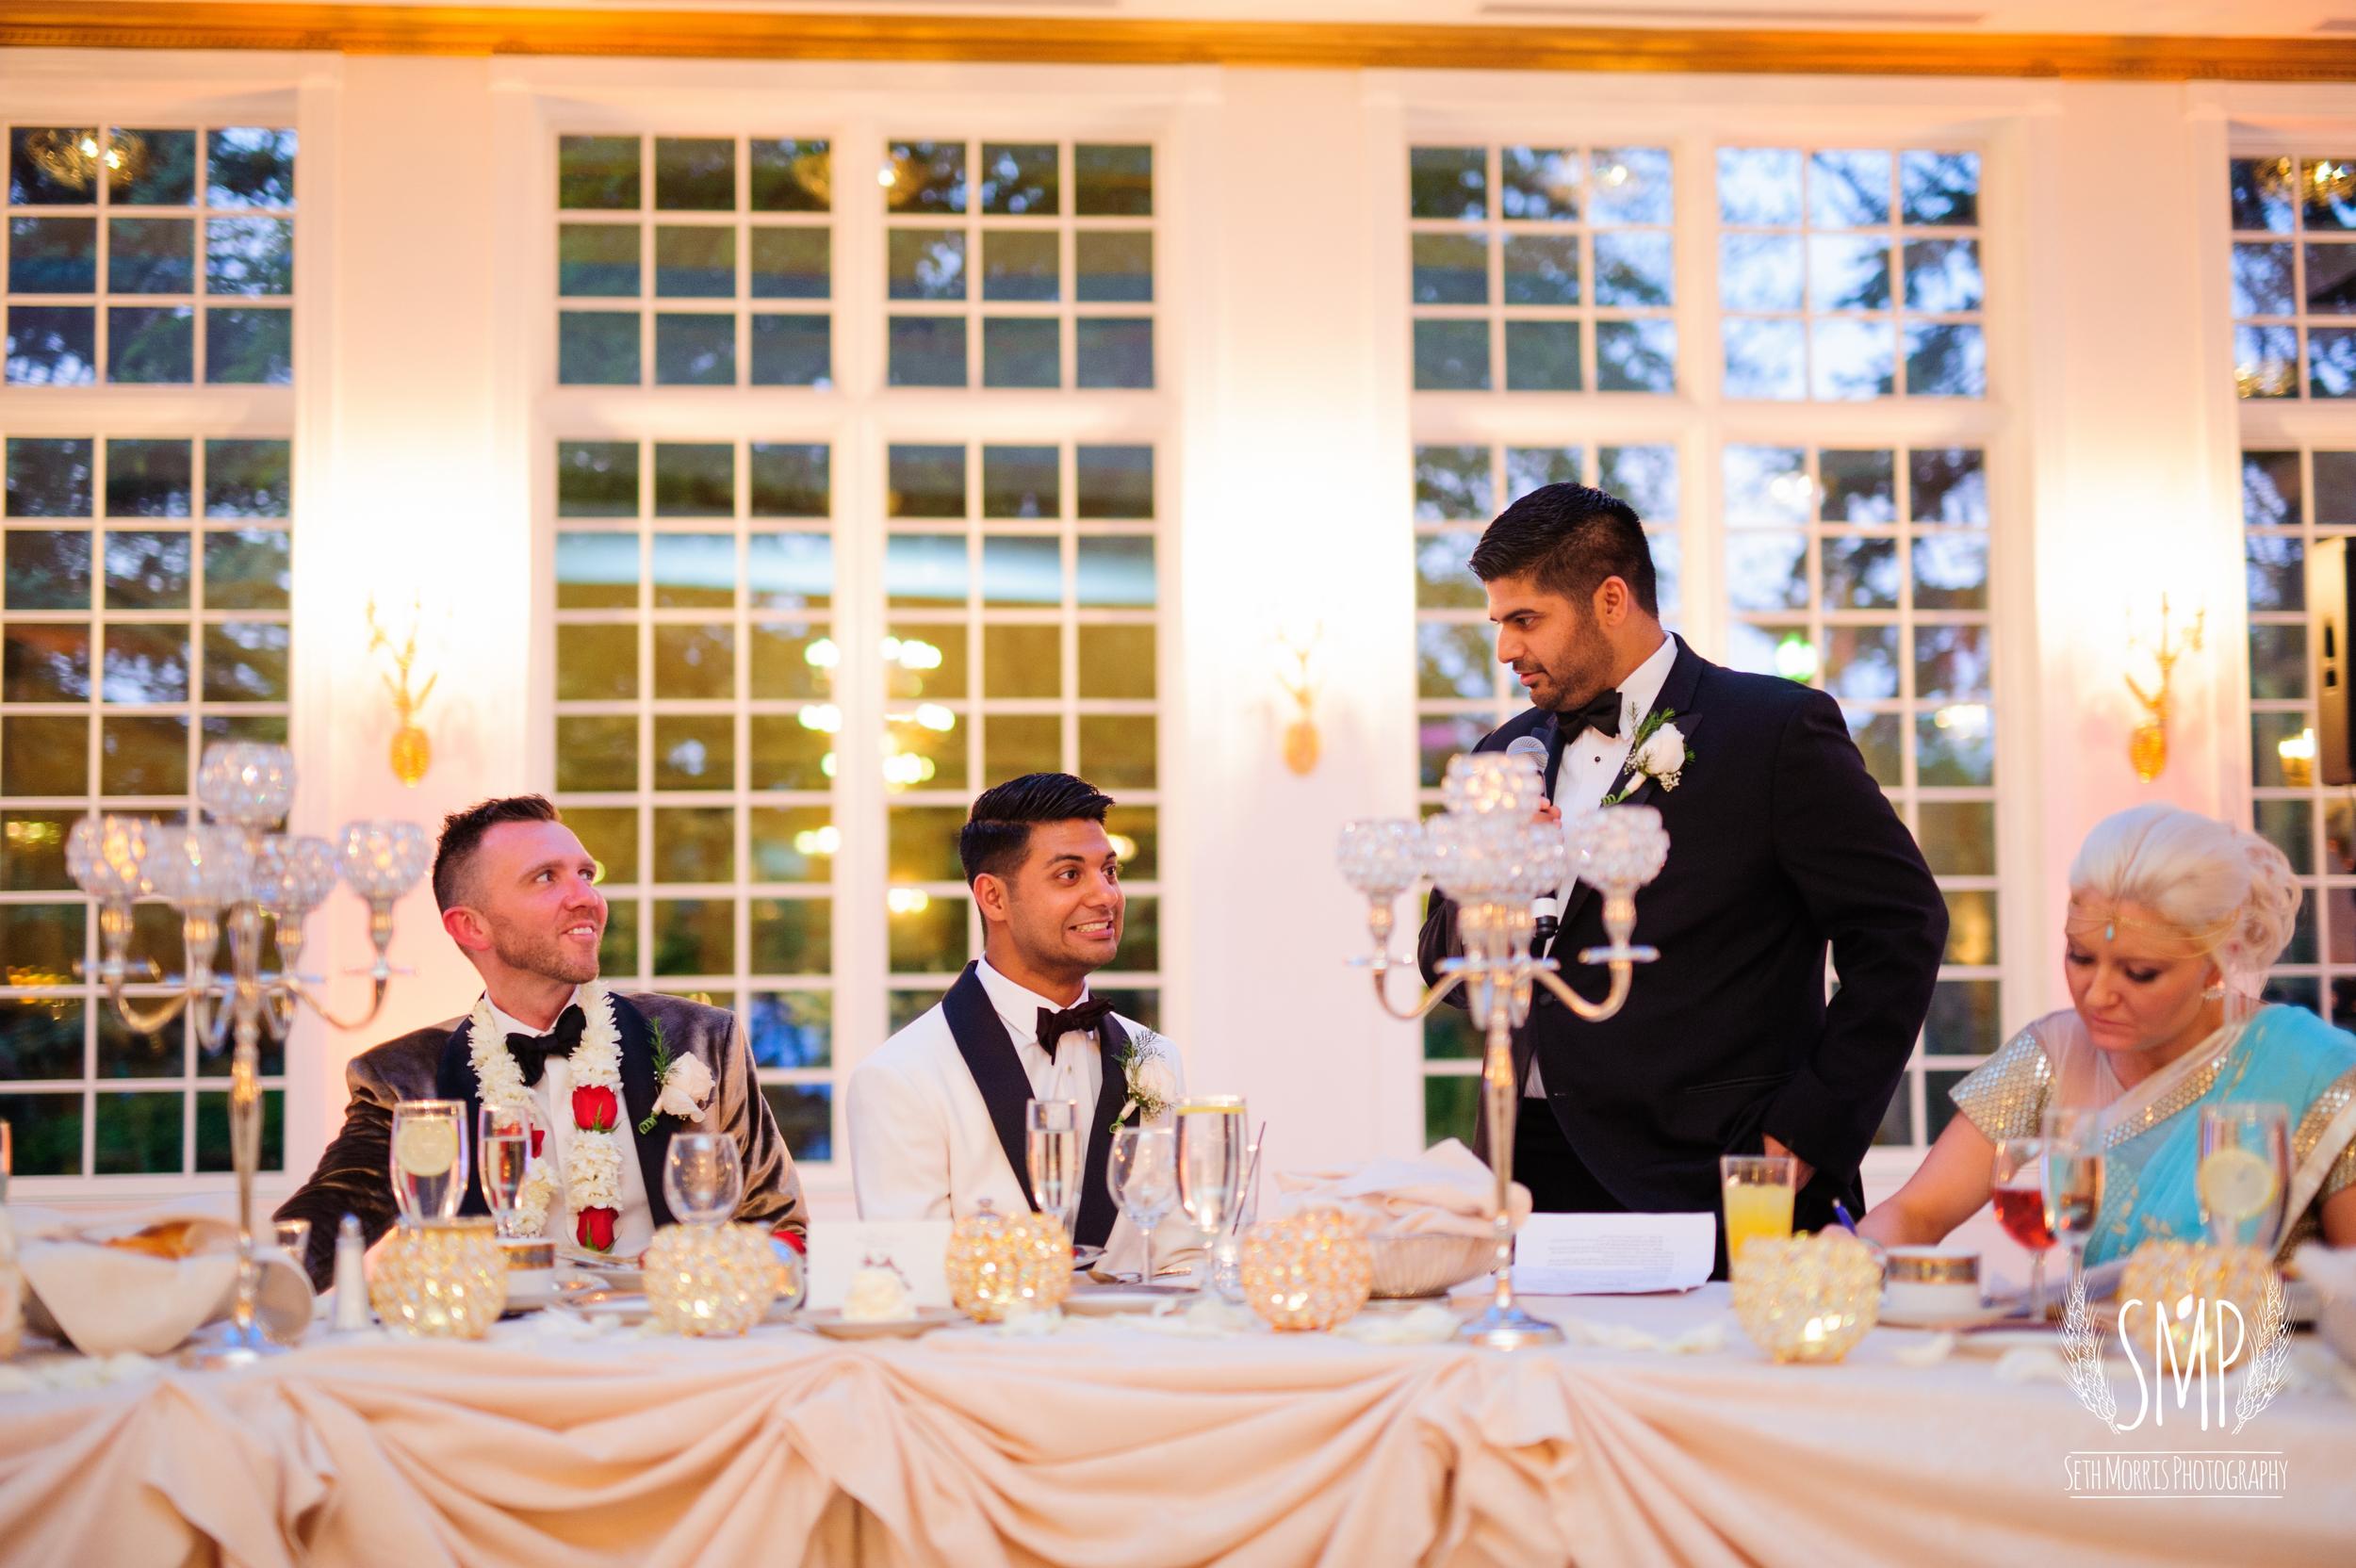 same-sex-wedding-photographer-chicago-illinois-95.jpg